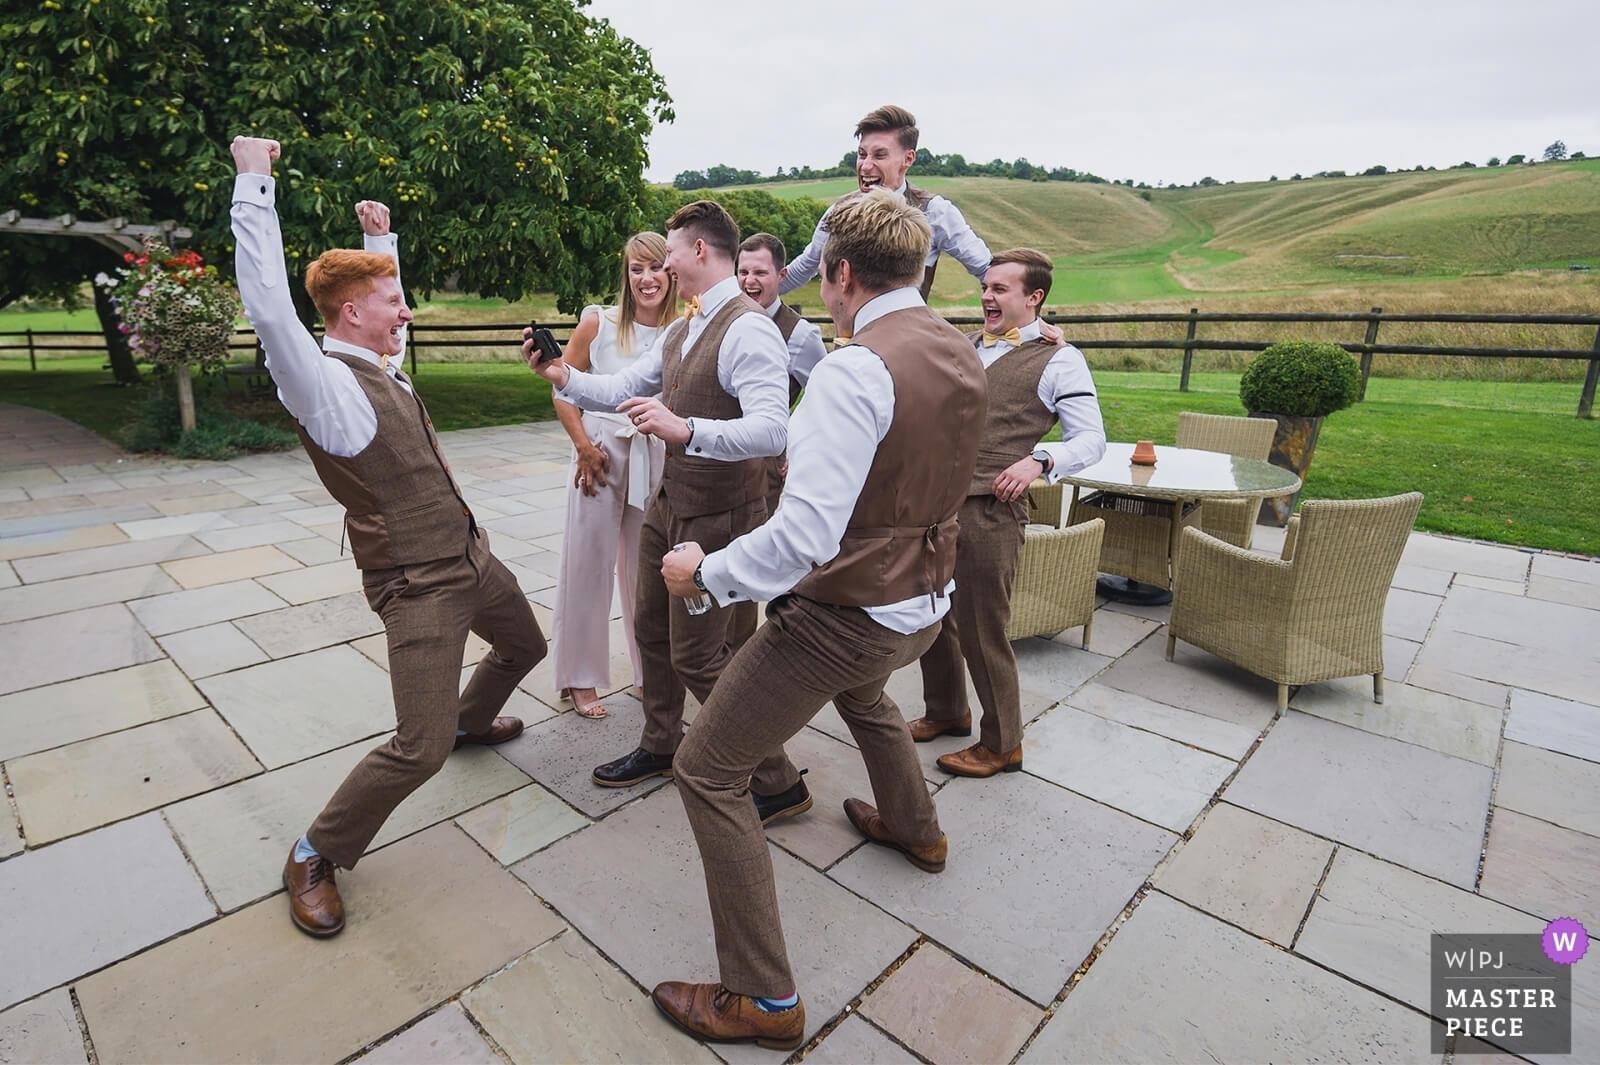 Wedding guests celebrating won a WPJA wedding  photography award